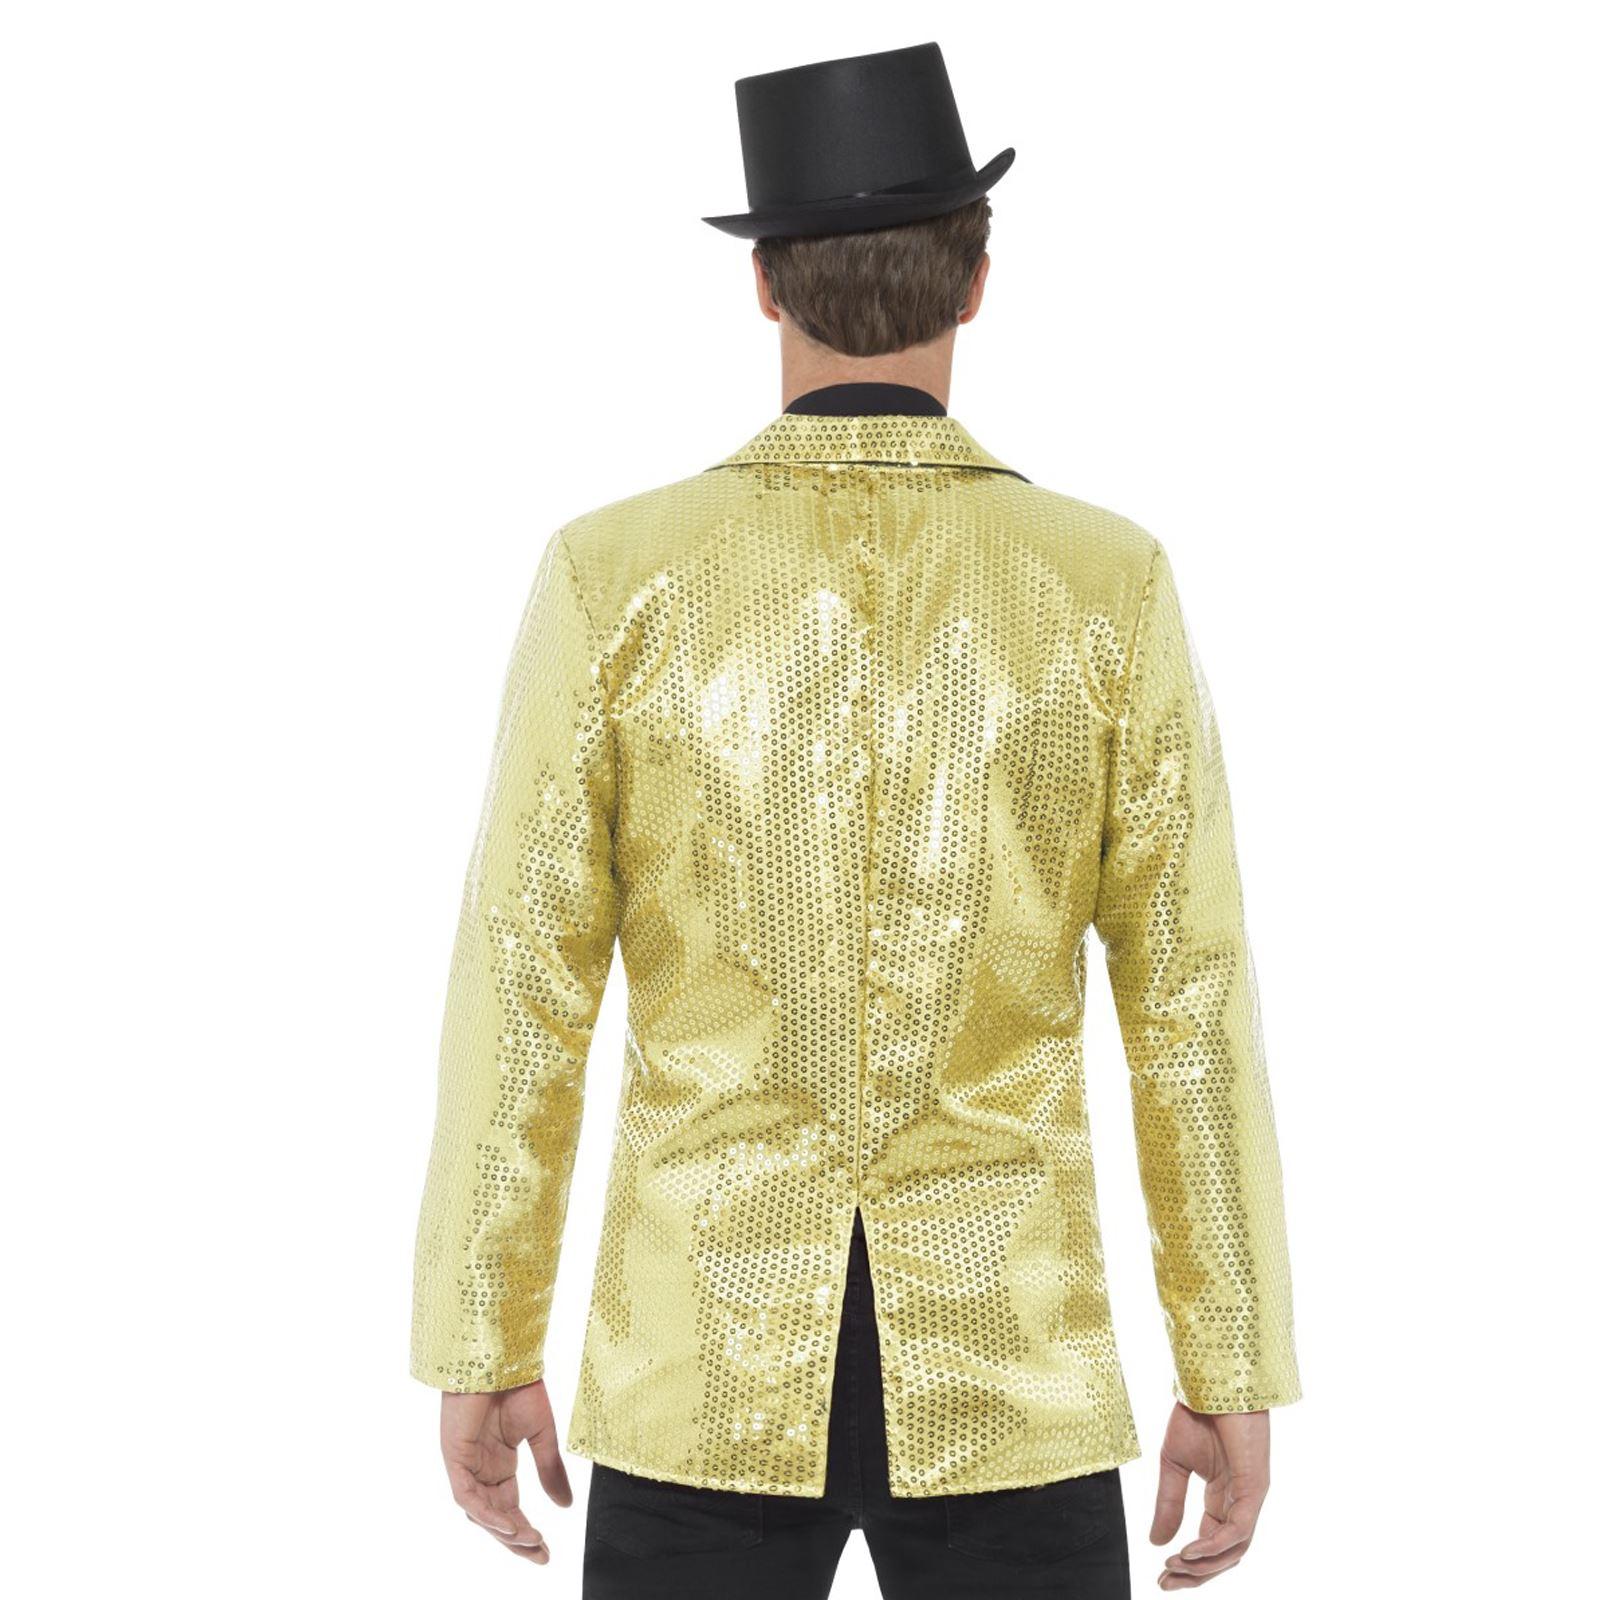 Adultes Jazz Dorés Sequins Hommes Ebay Showman Veste Loyal Monsieur wqYwPrS